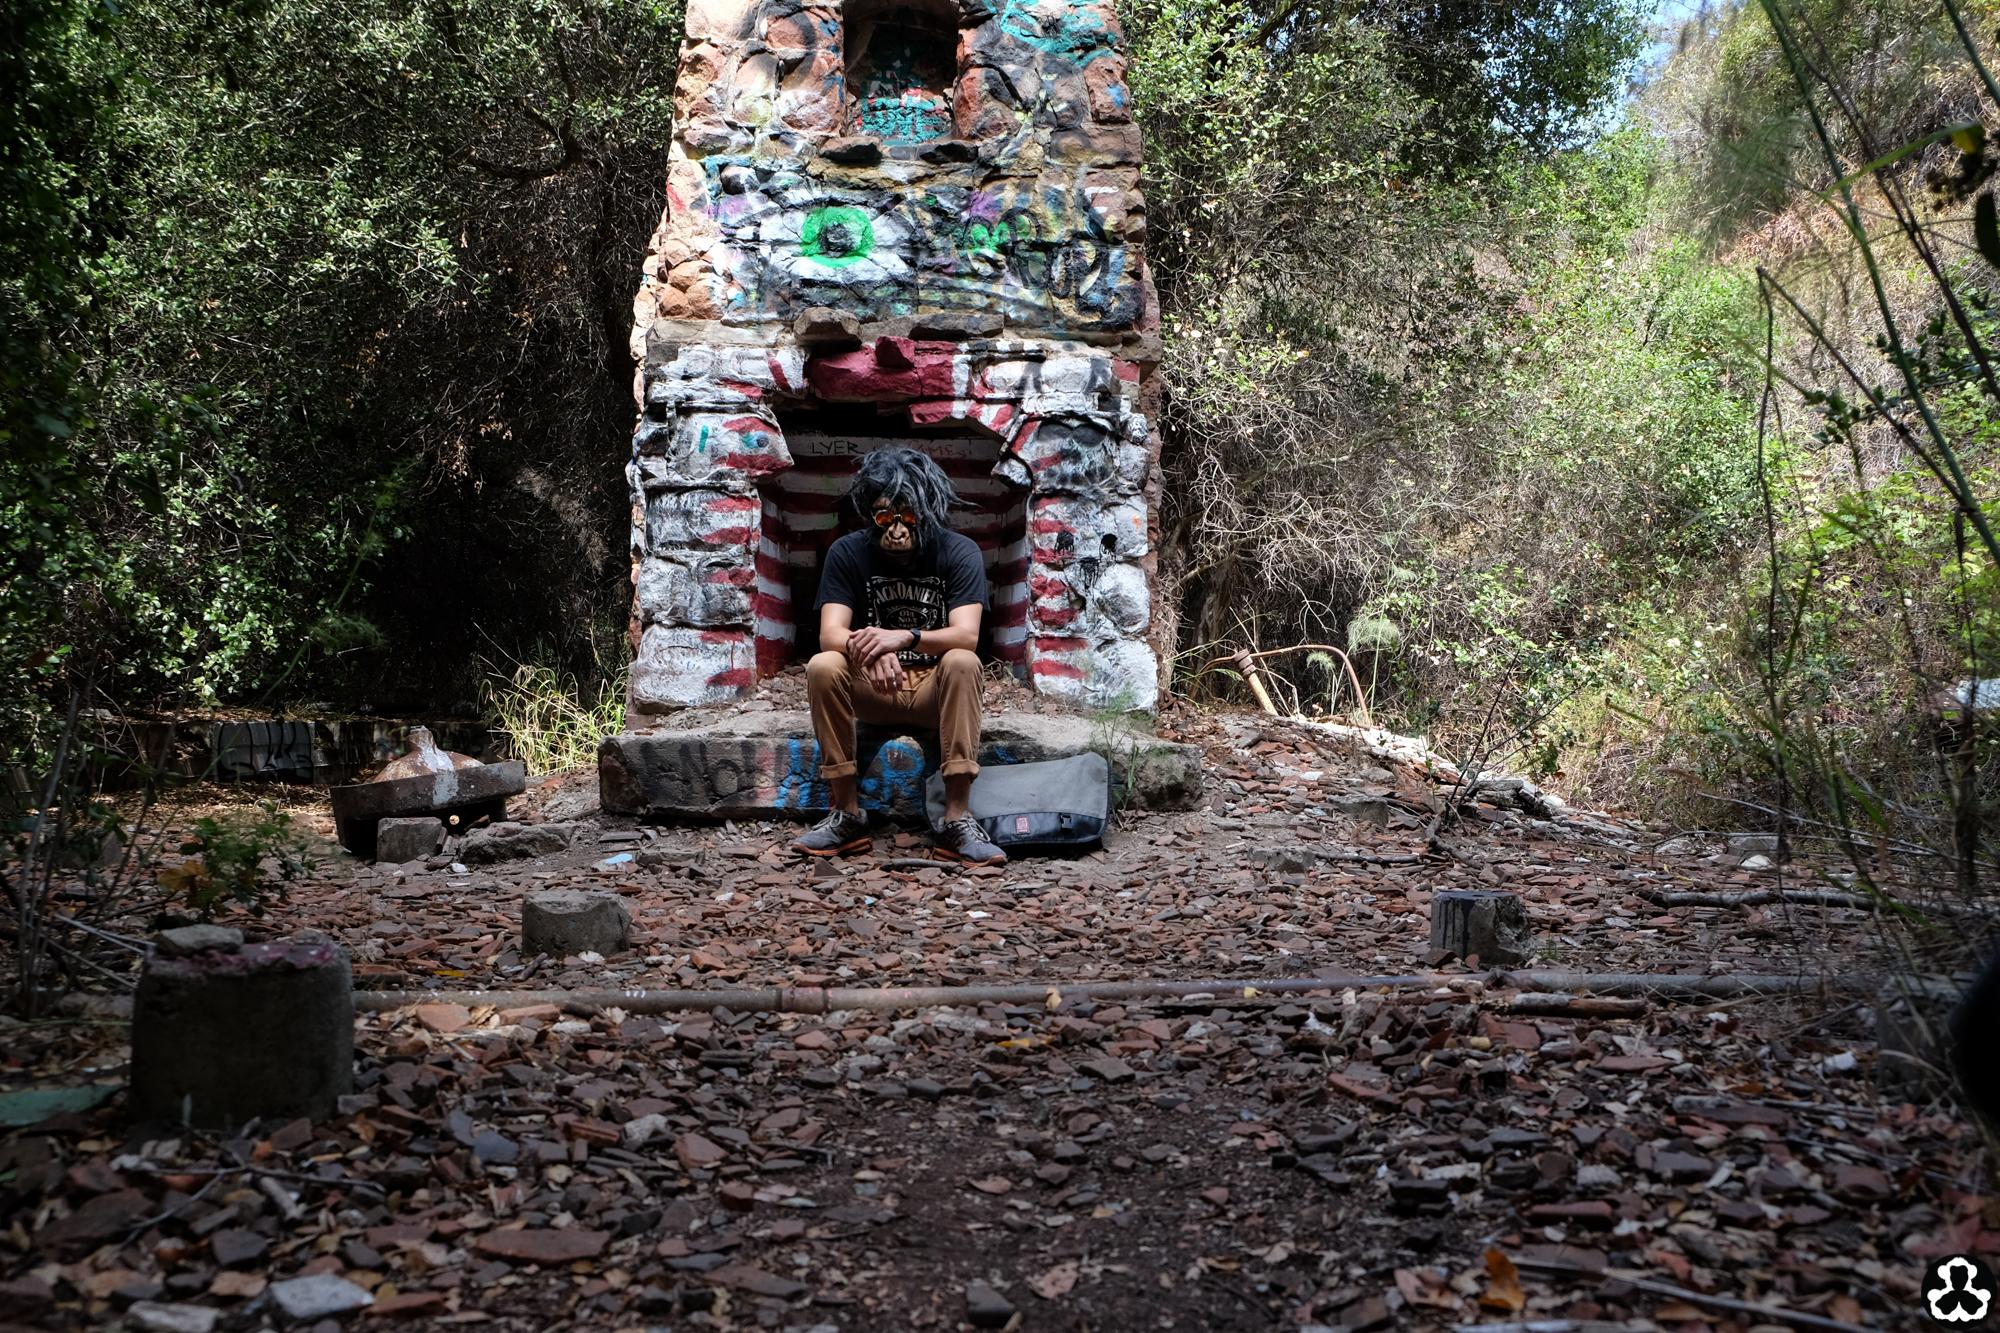 ape-is-dapper-los-angeles-nazi-yards-graffiti-9.jpg